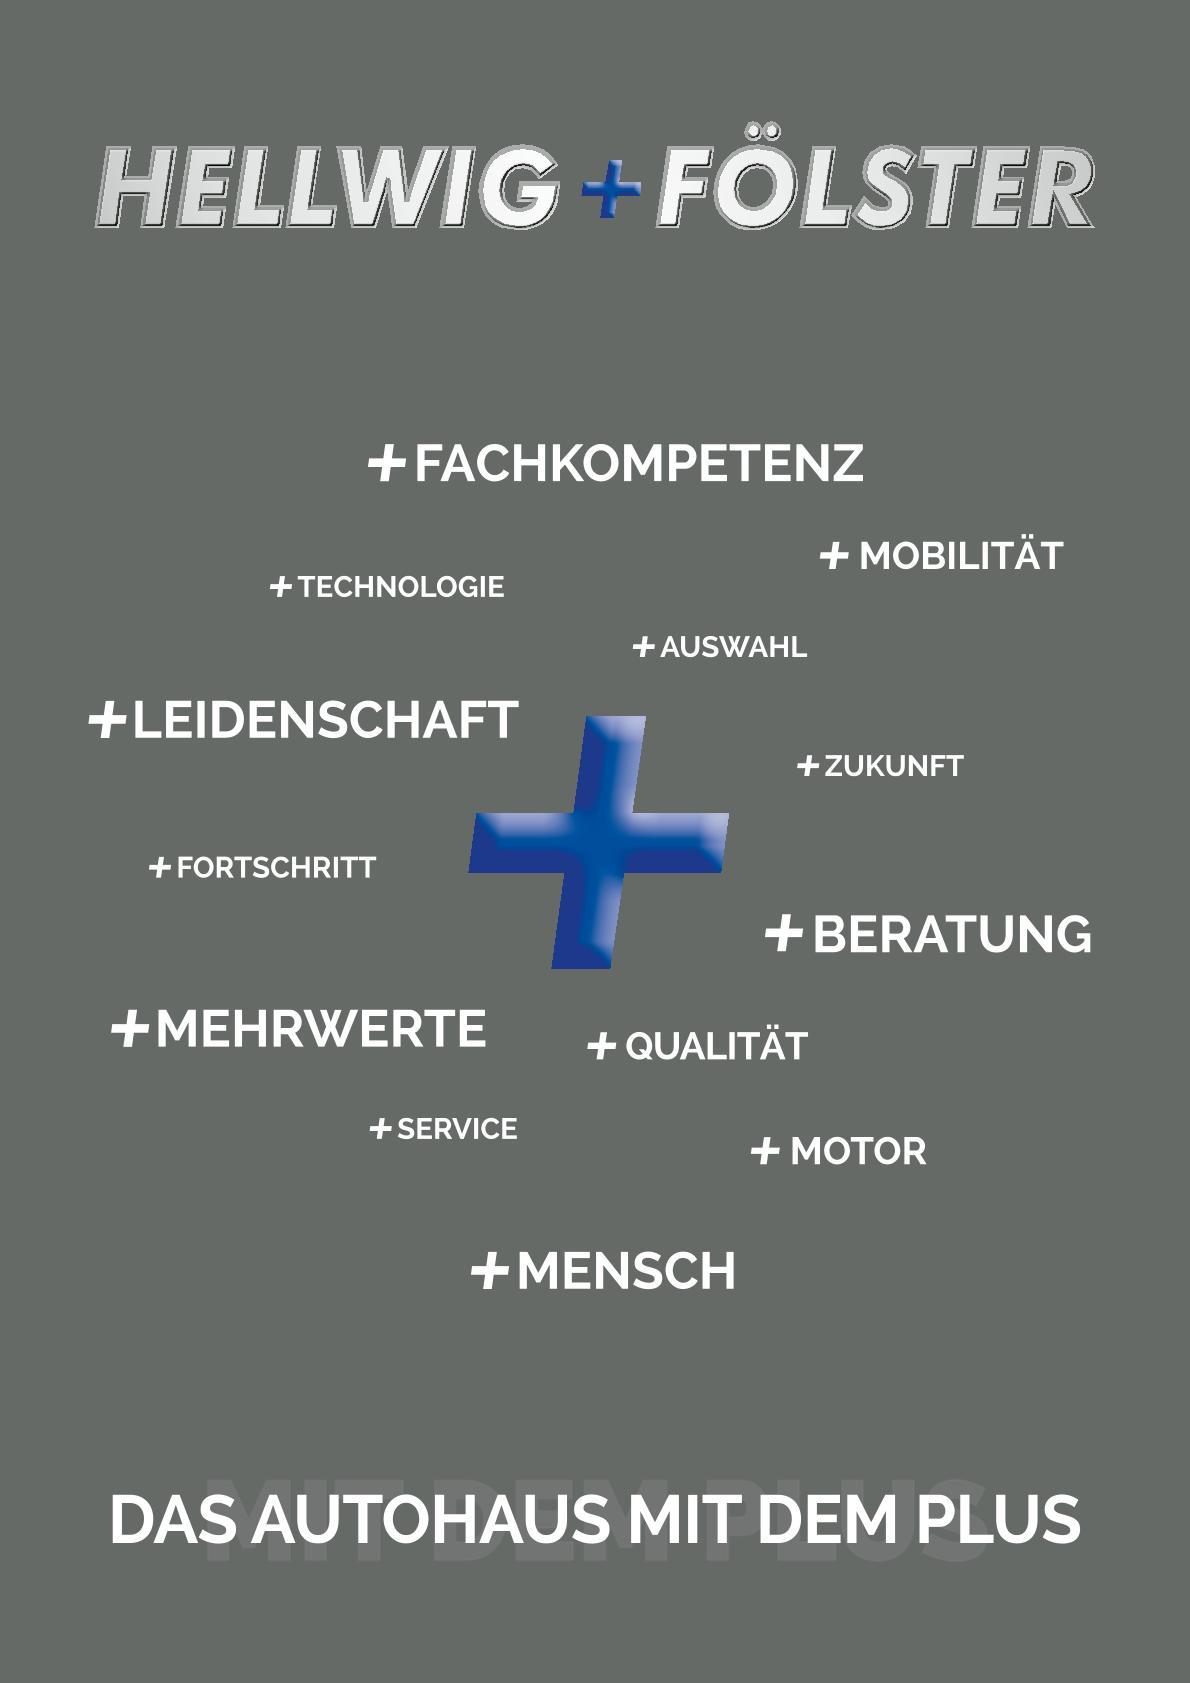 Titelseite Firmenbroschüre Hellwig+Fölster